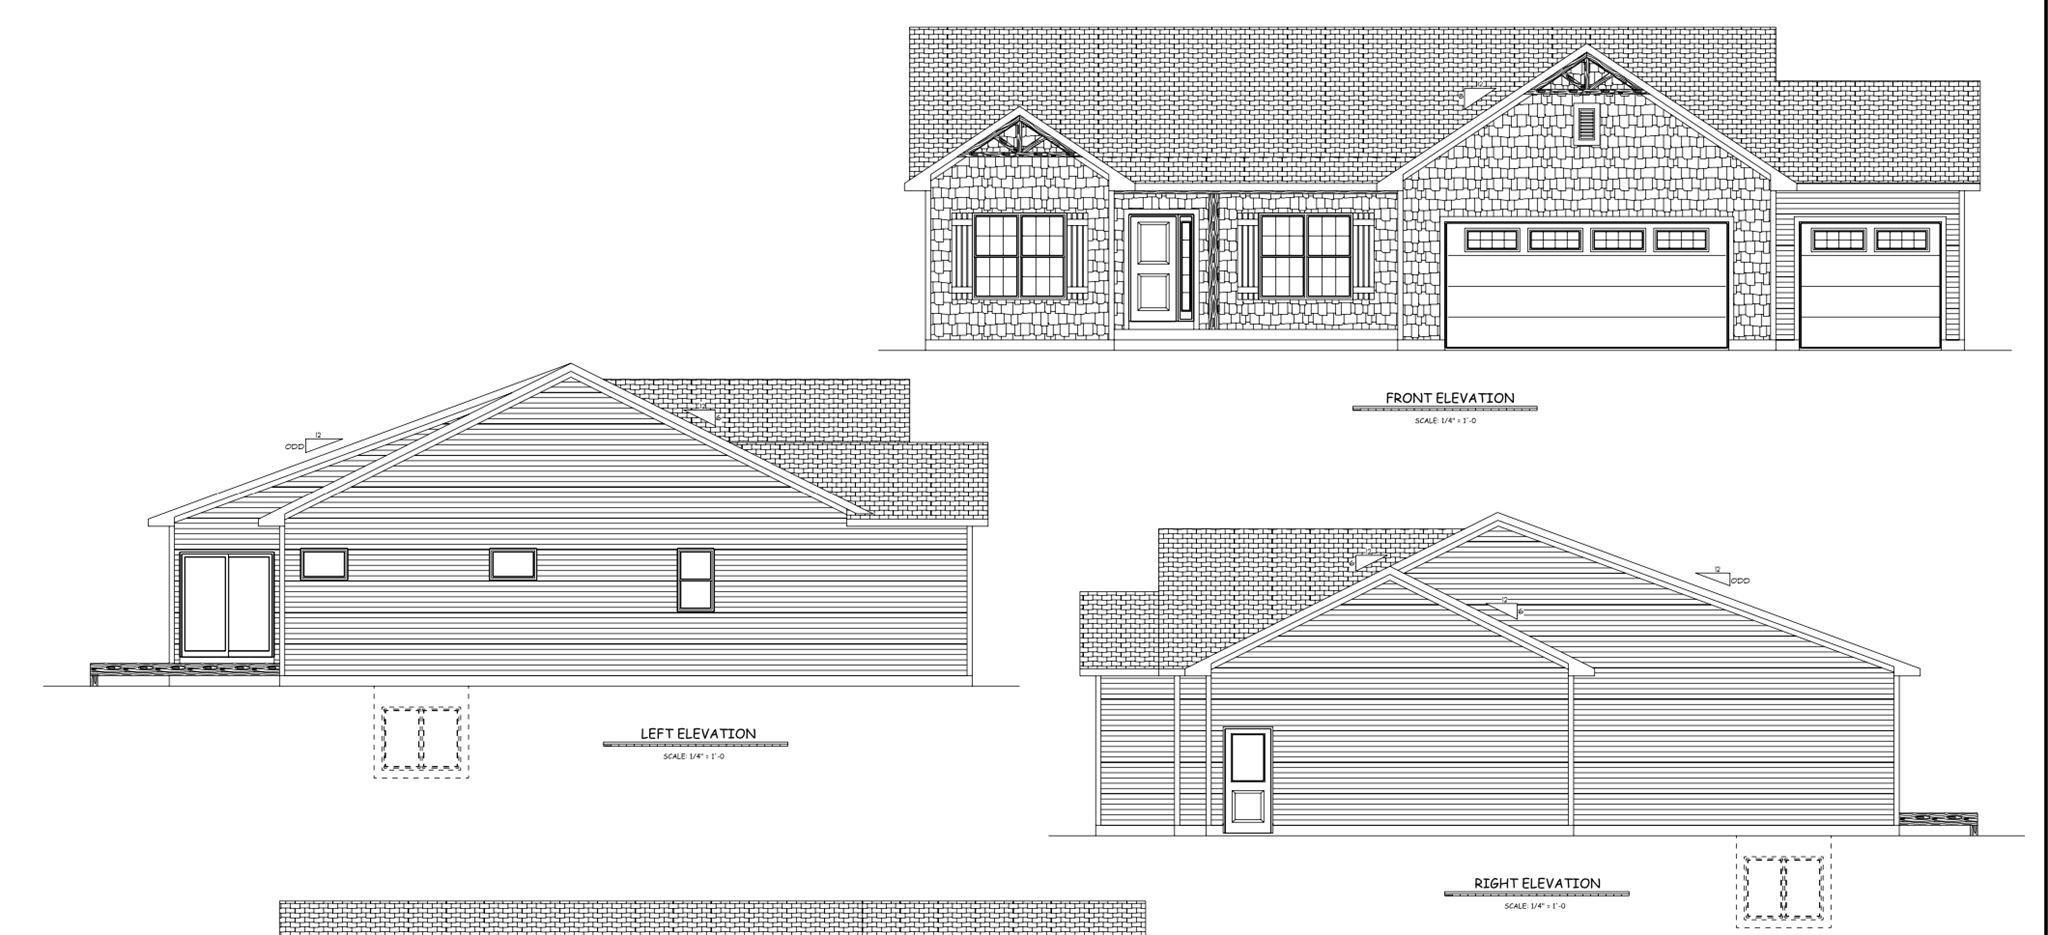 1101 S 5TH Property Photo - Eldridge, IA real estate listing